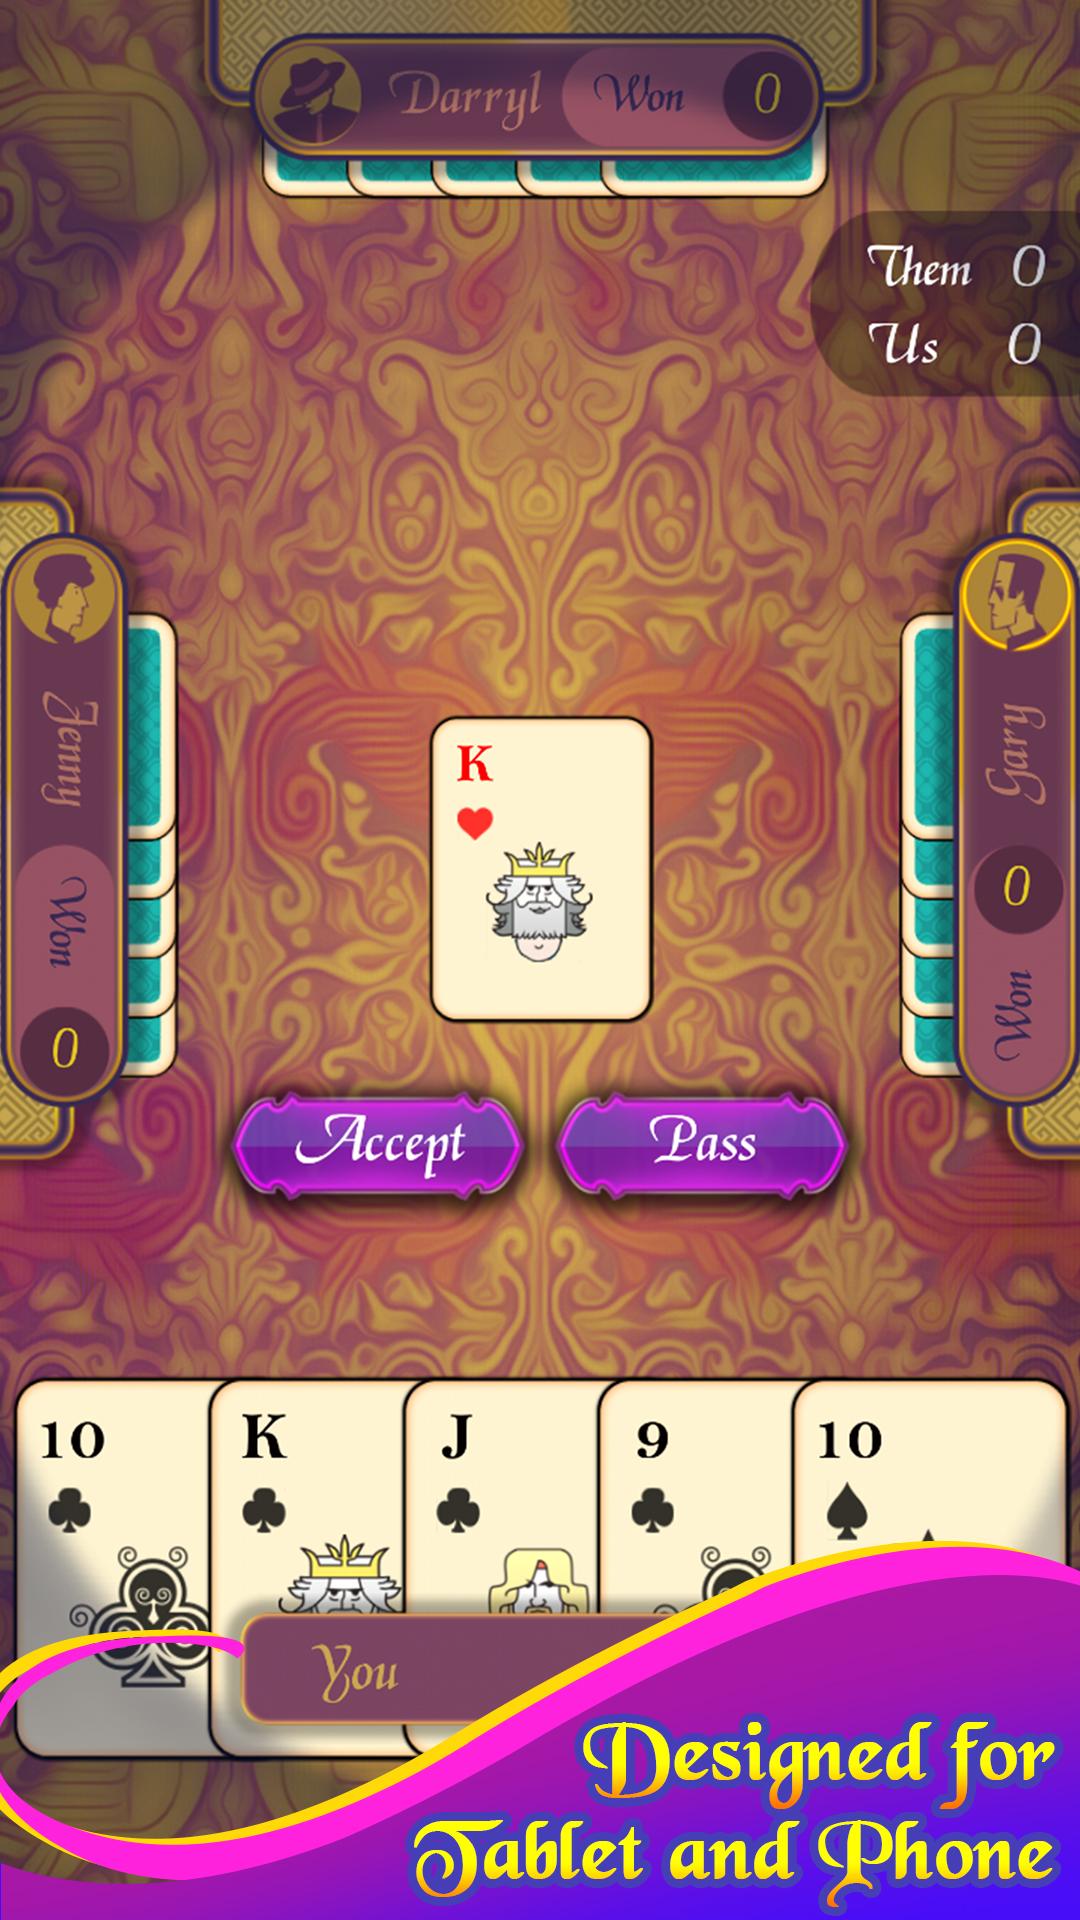 euchre card game rules pdf